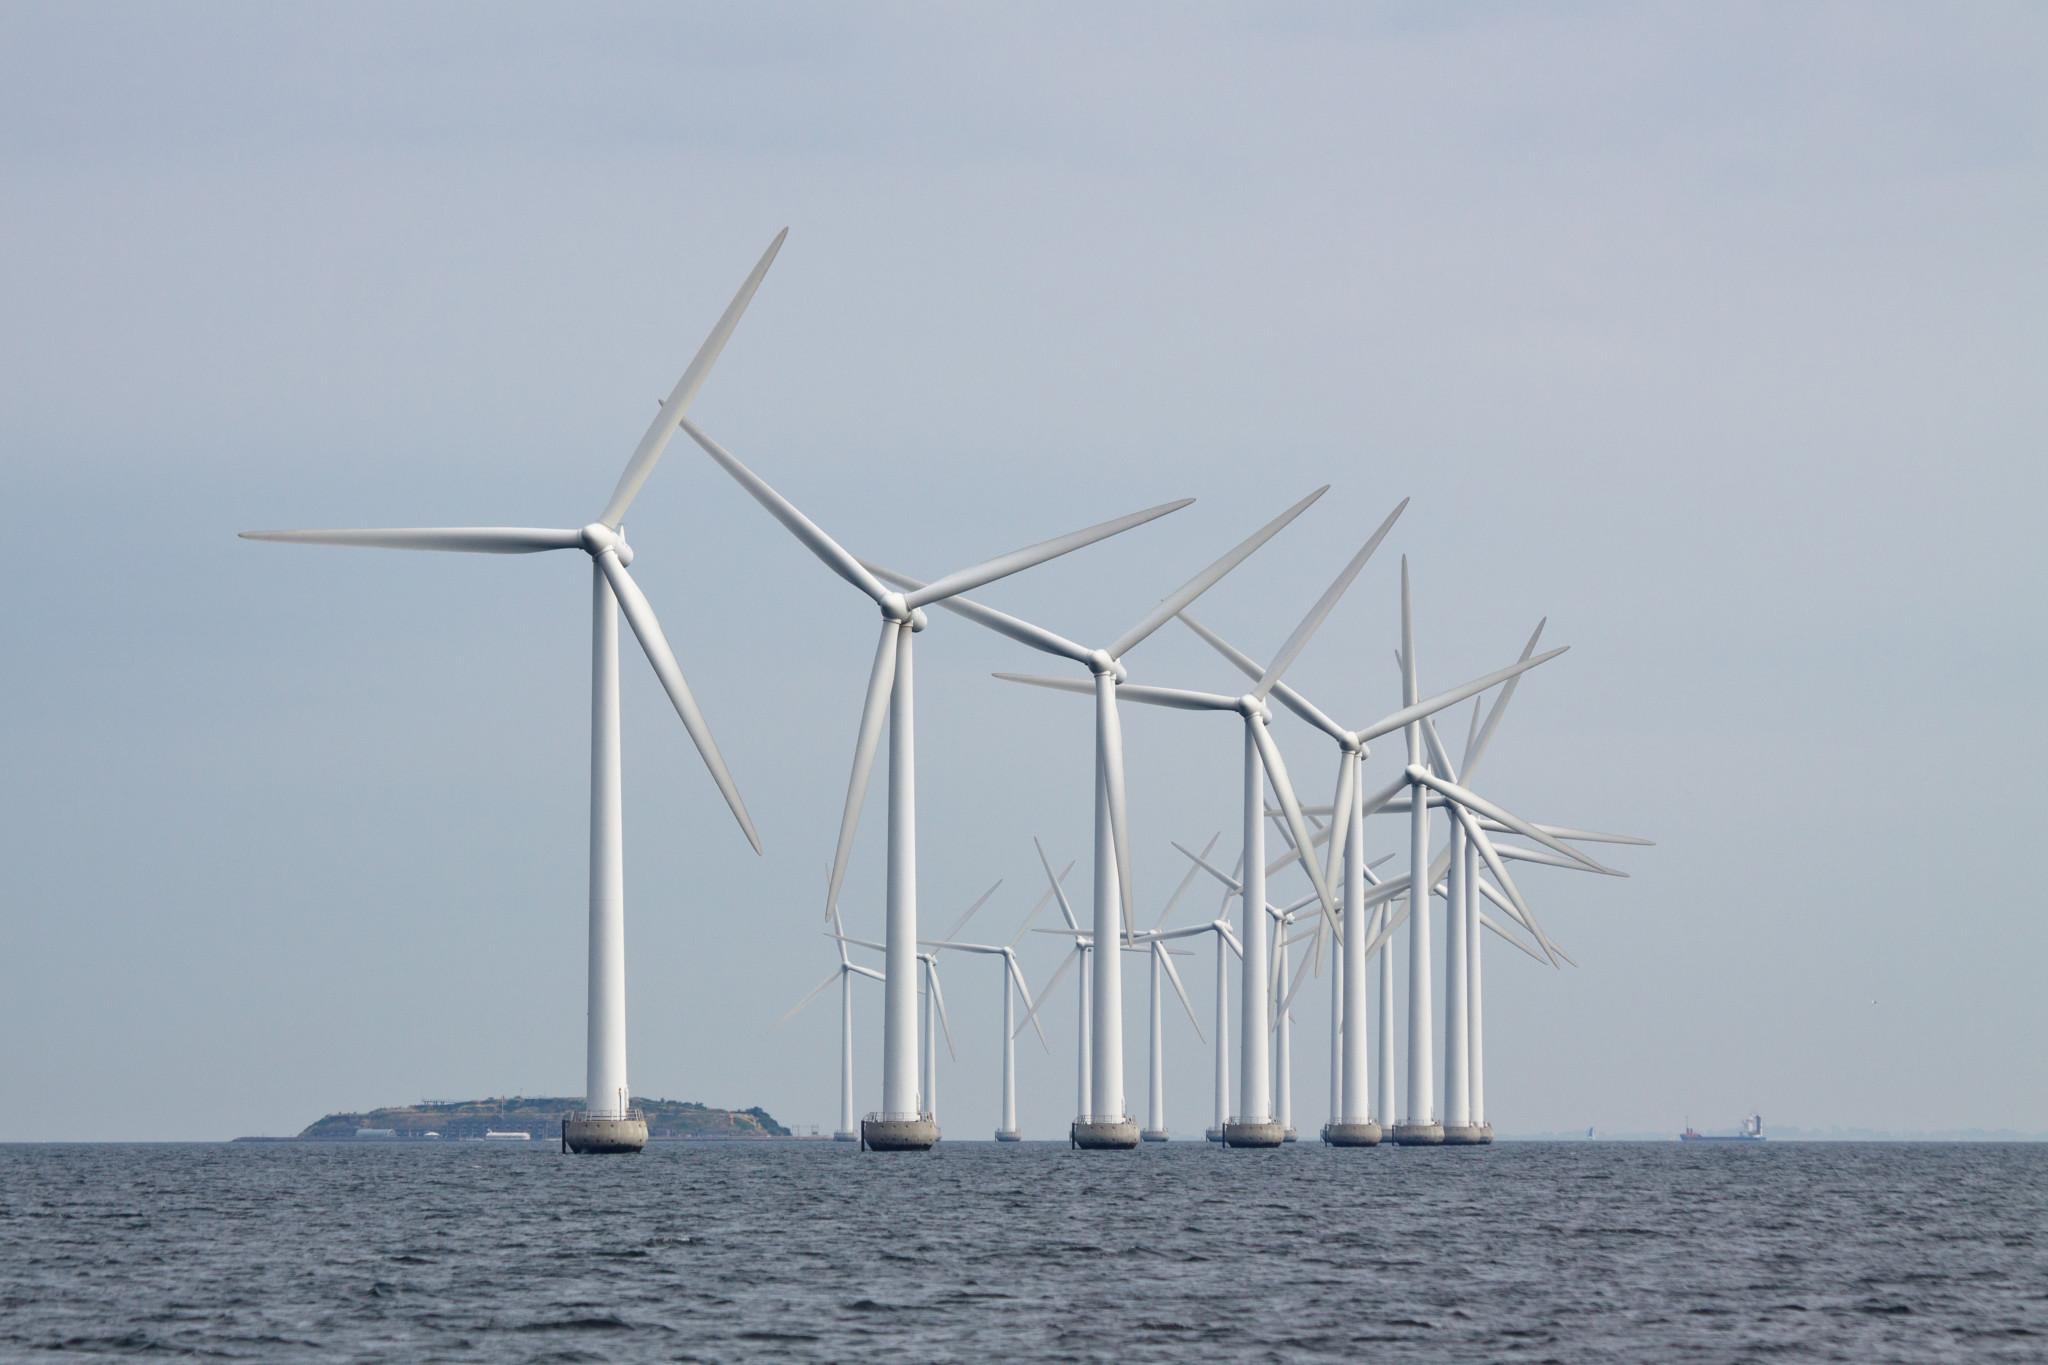 danemark eolien electricite 2019 - L'Energeek